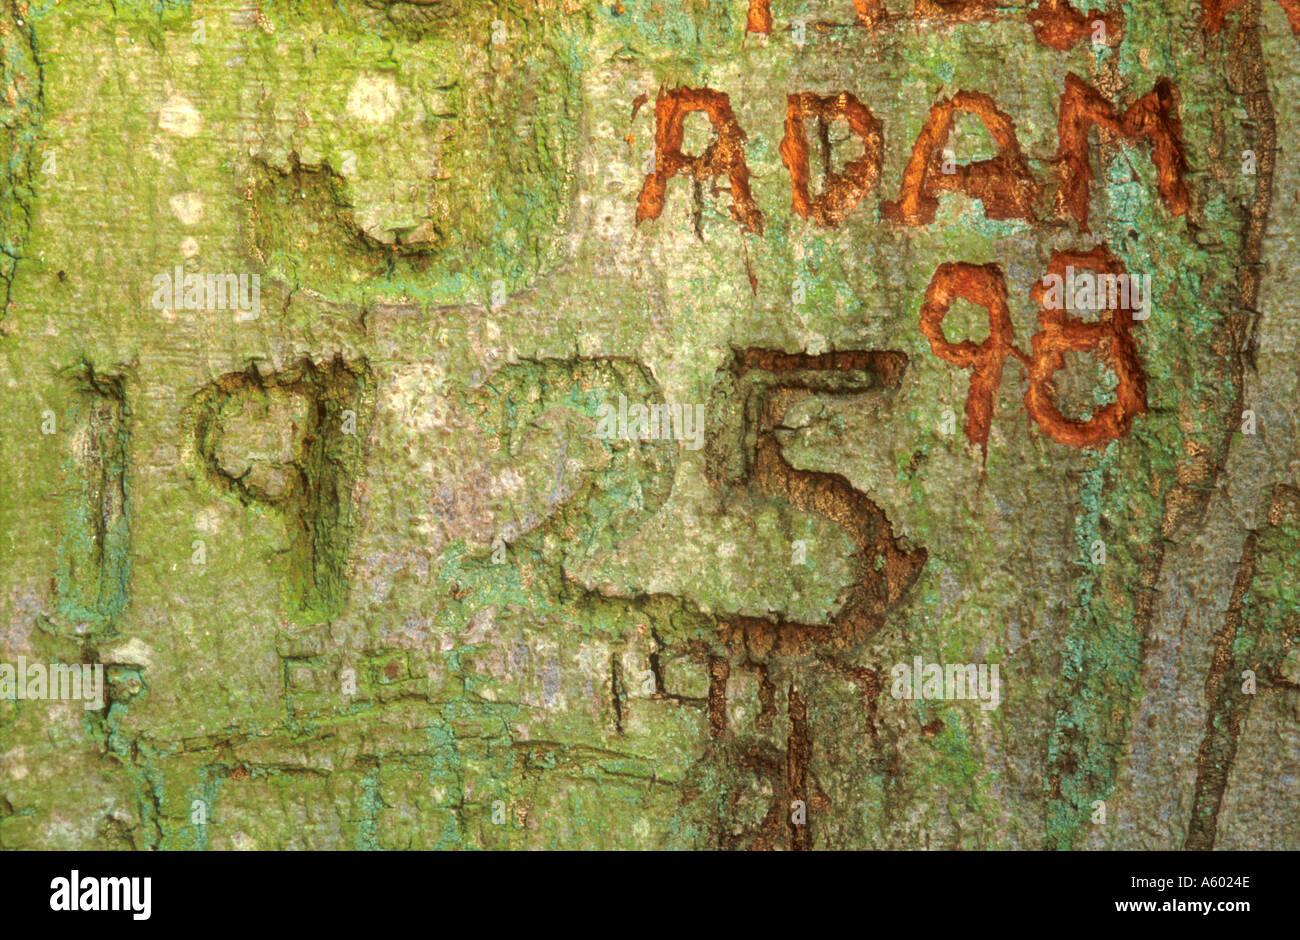 Graffiti carved in bark of tree blickling norfolk east anglia england uk stock image